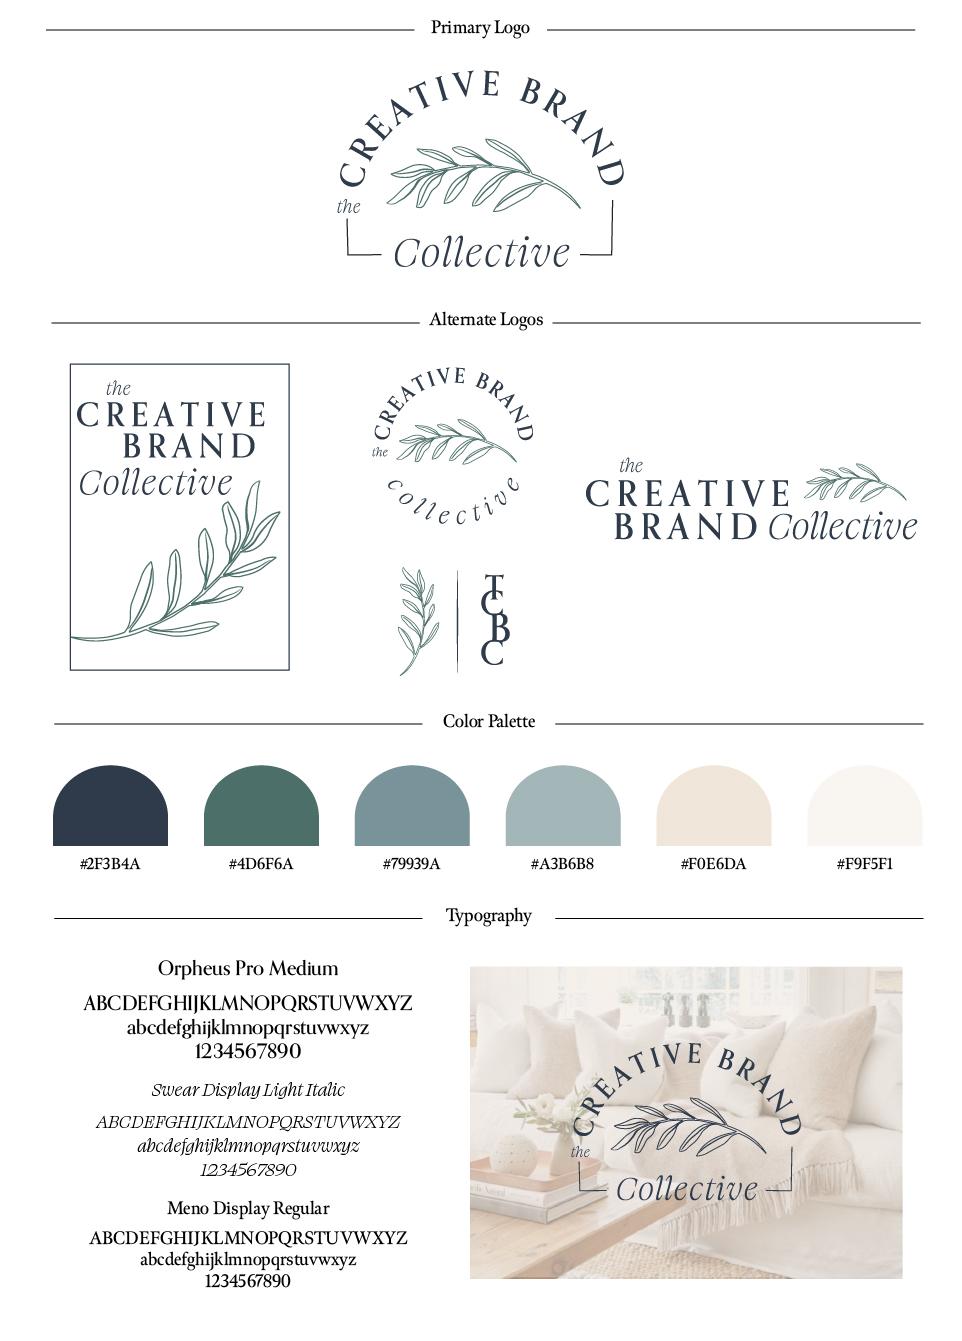 Creative Brand Collective Full Brand Guide